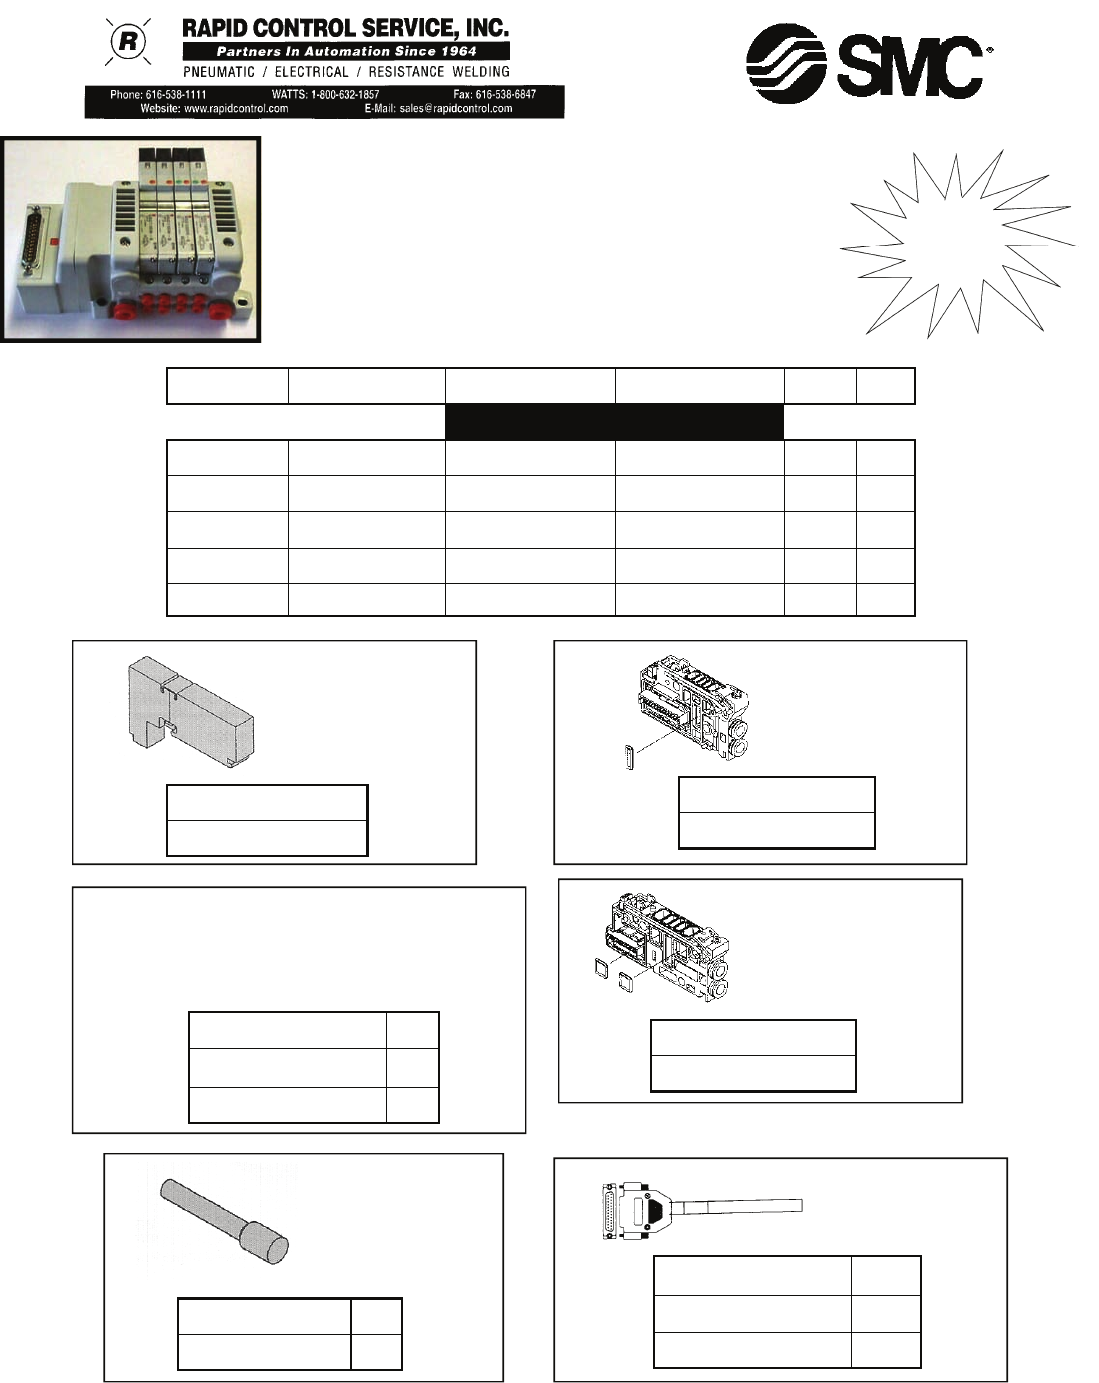 john deere 420 garden tractor wiring diagram wiring. Black Bedroom Furniture Sets. Home Design Ideas